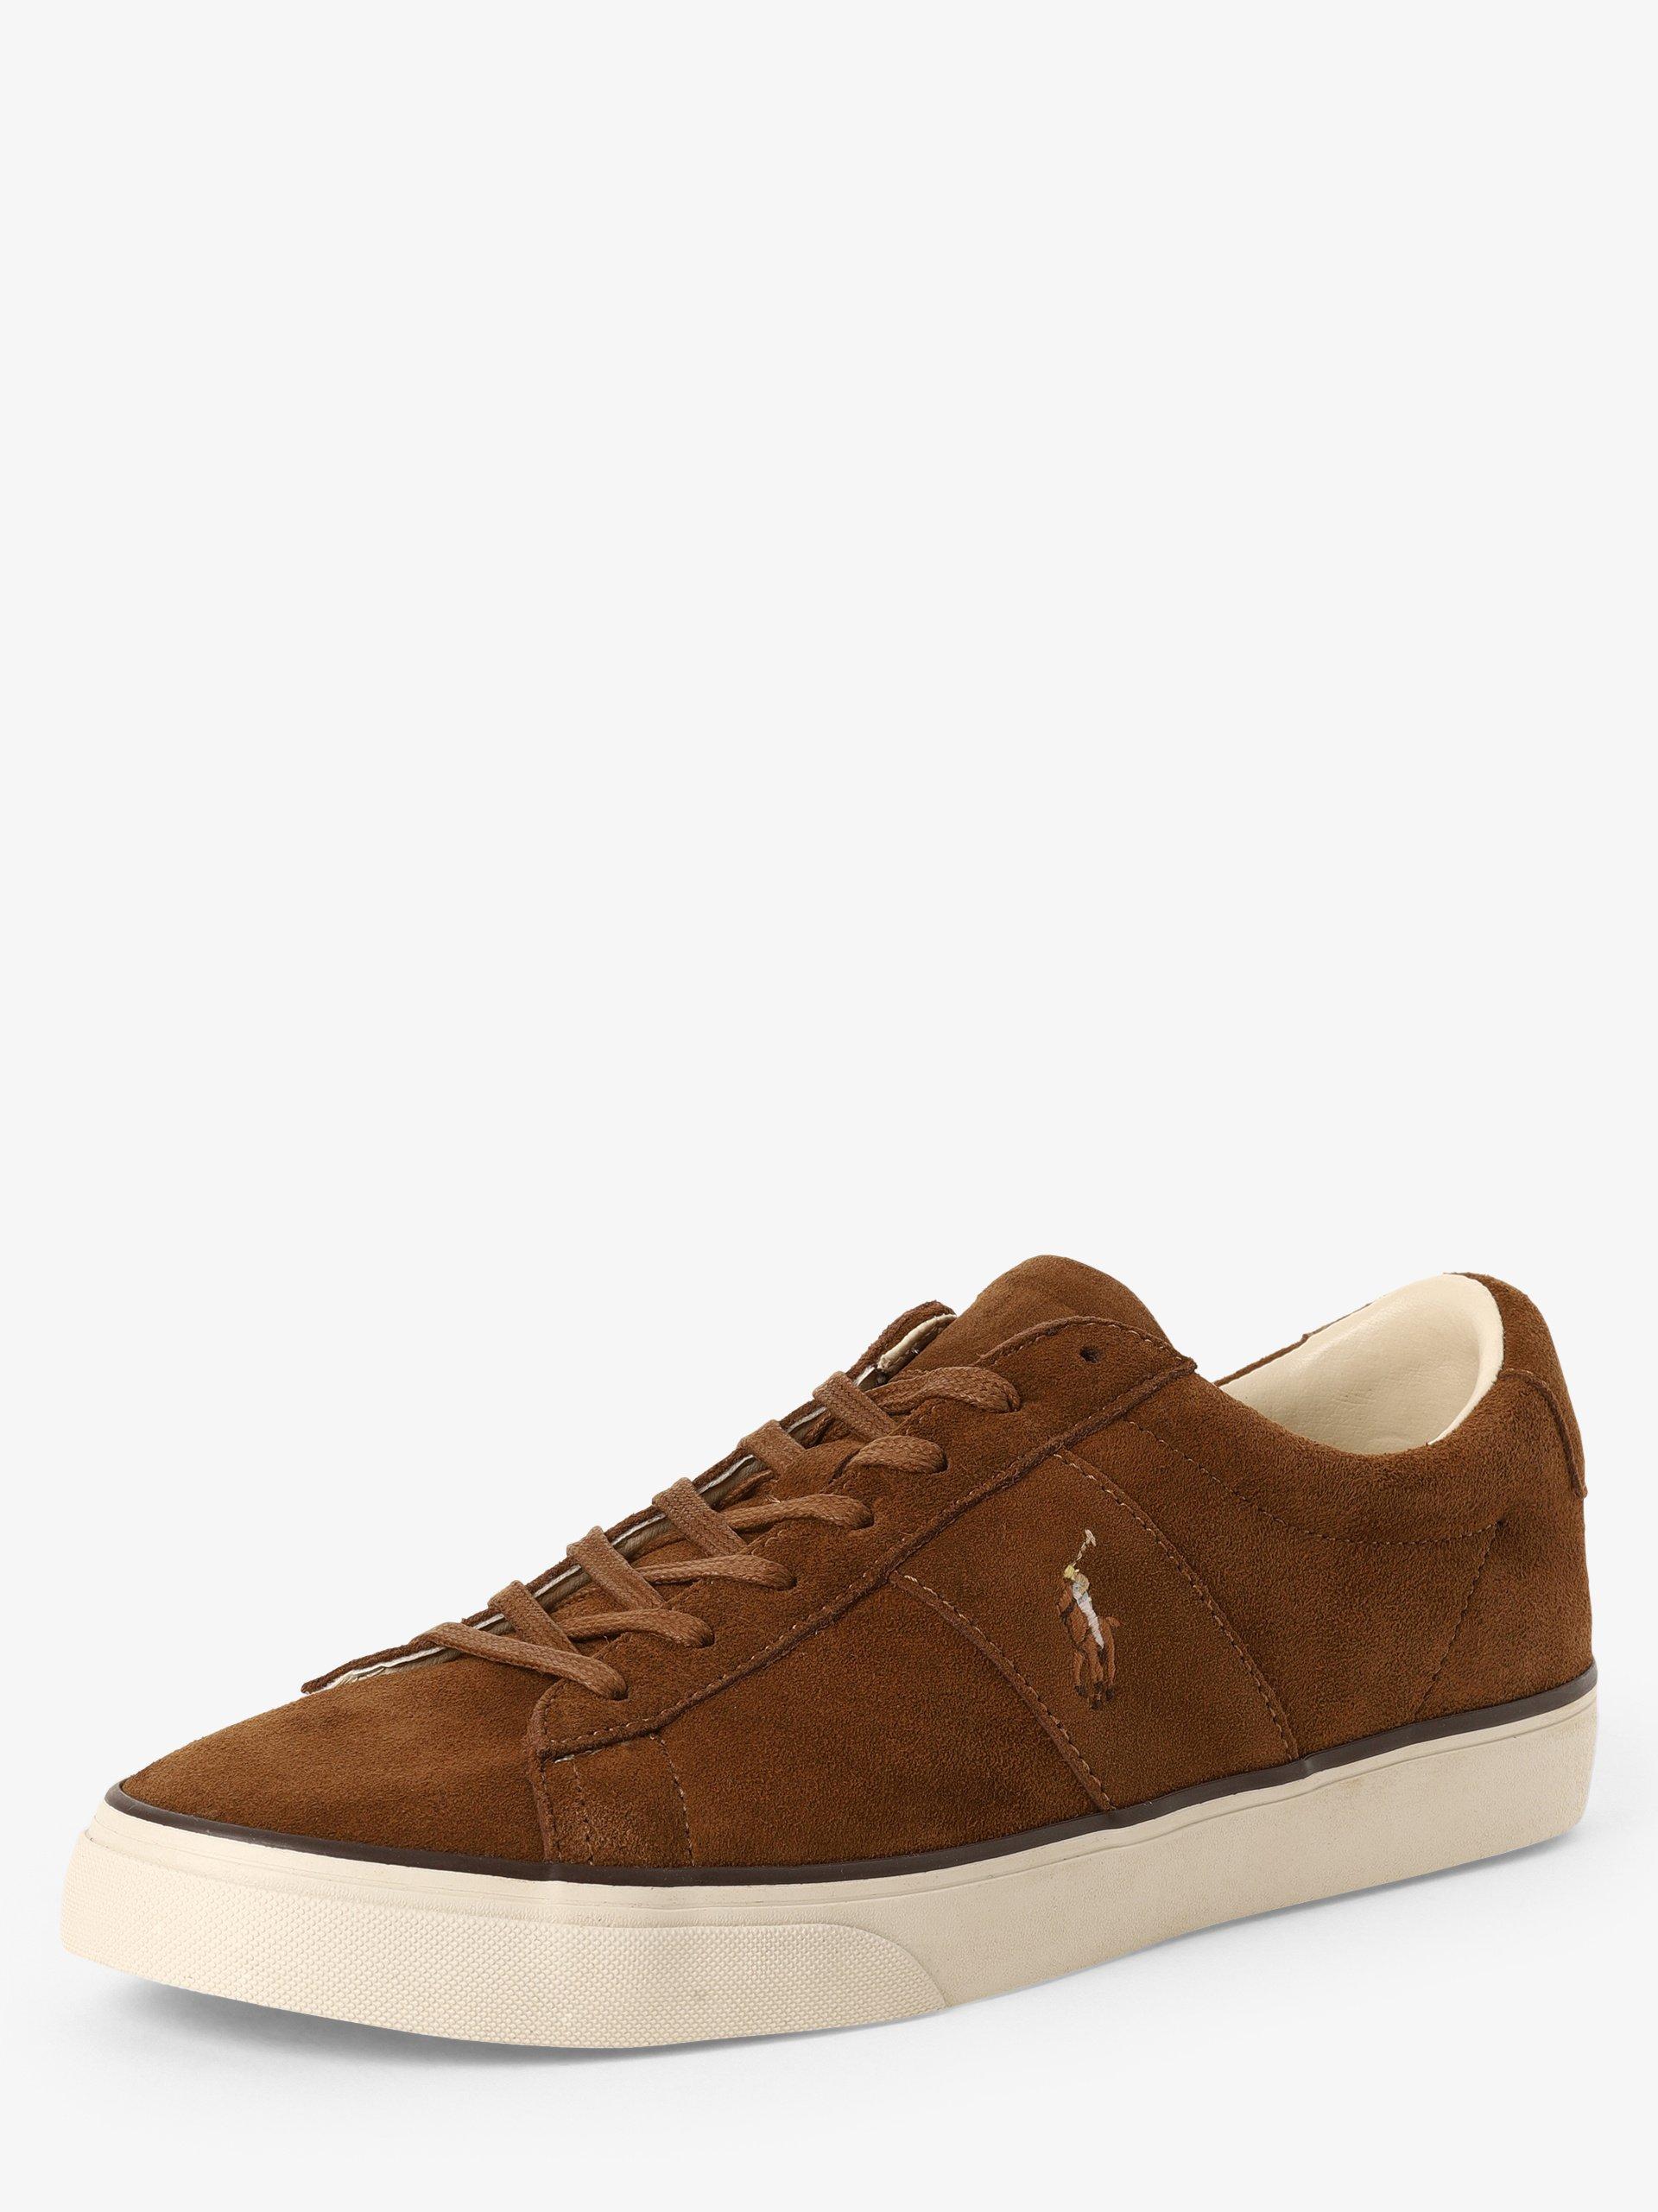 Polo Ralph Lauren Herren Sneaker aus Leder